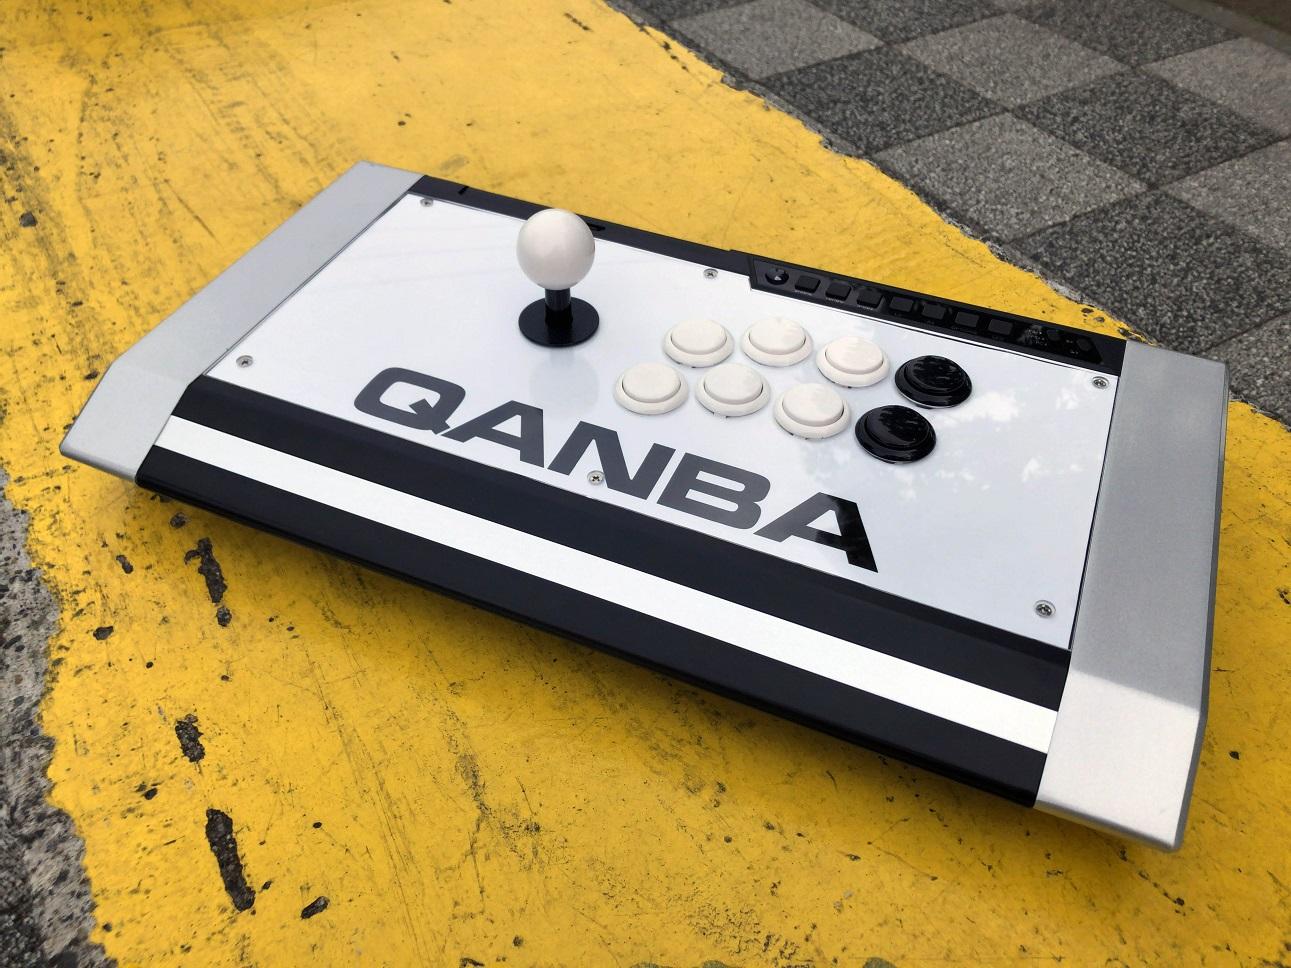 Qanba Obsidian (オブシディアン) アーケードジョイスティック用 標準レイアウト クリアパネル